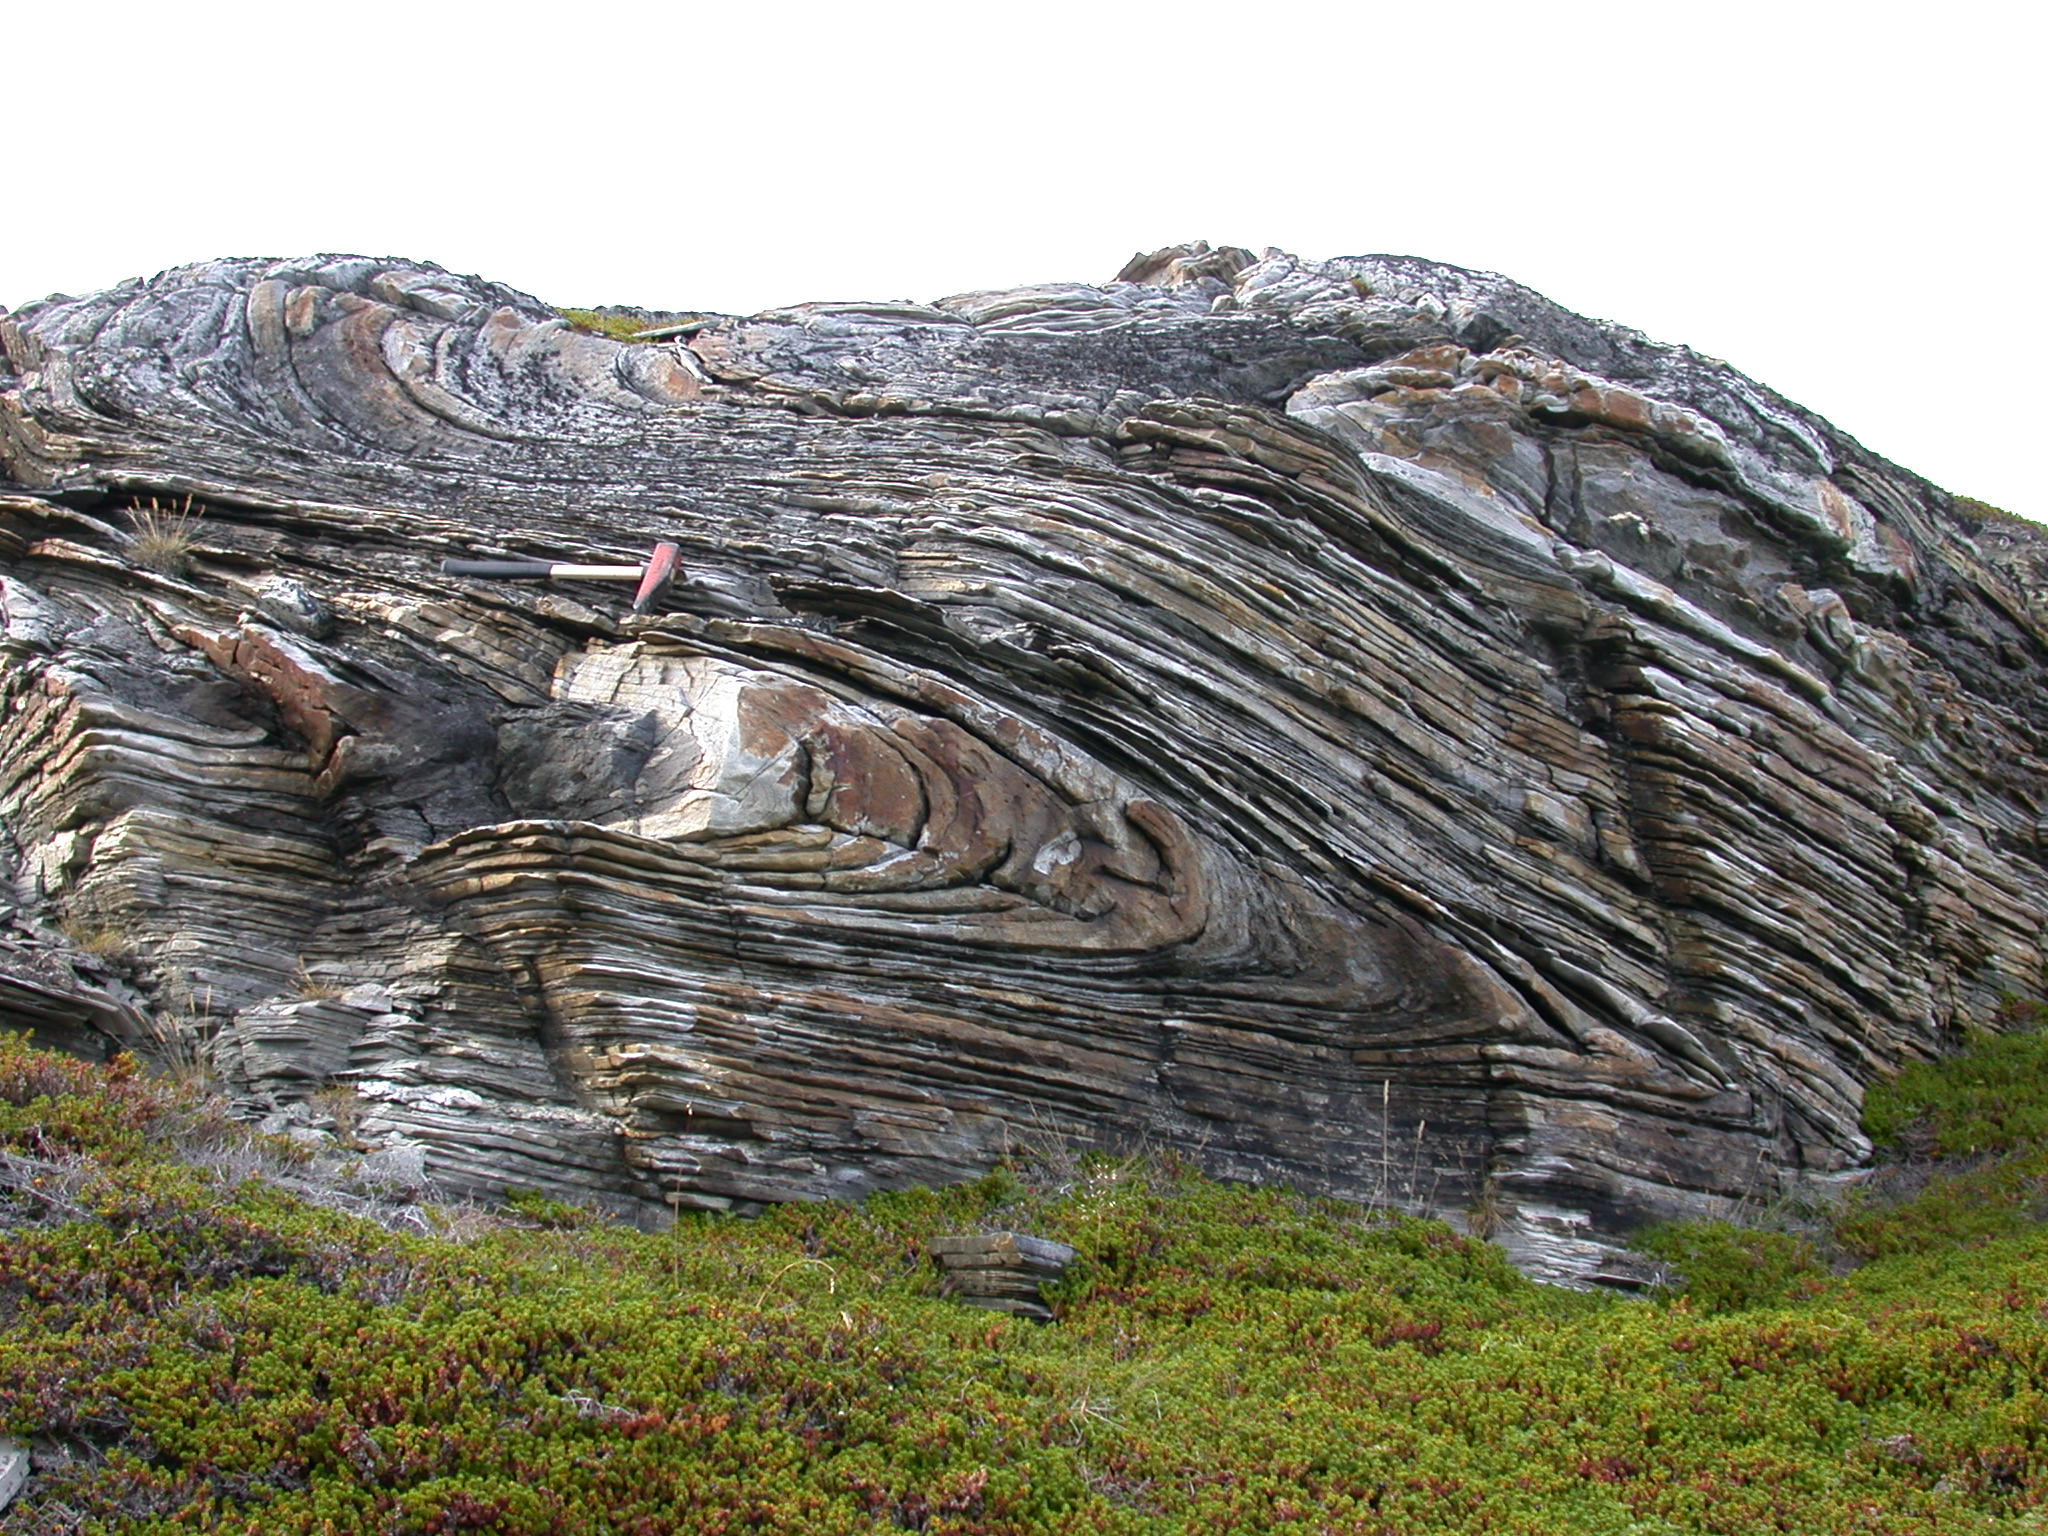 geology wallpaper hd - photo #35